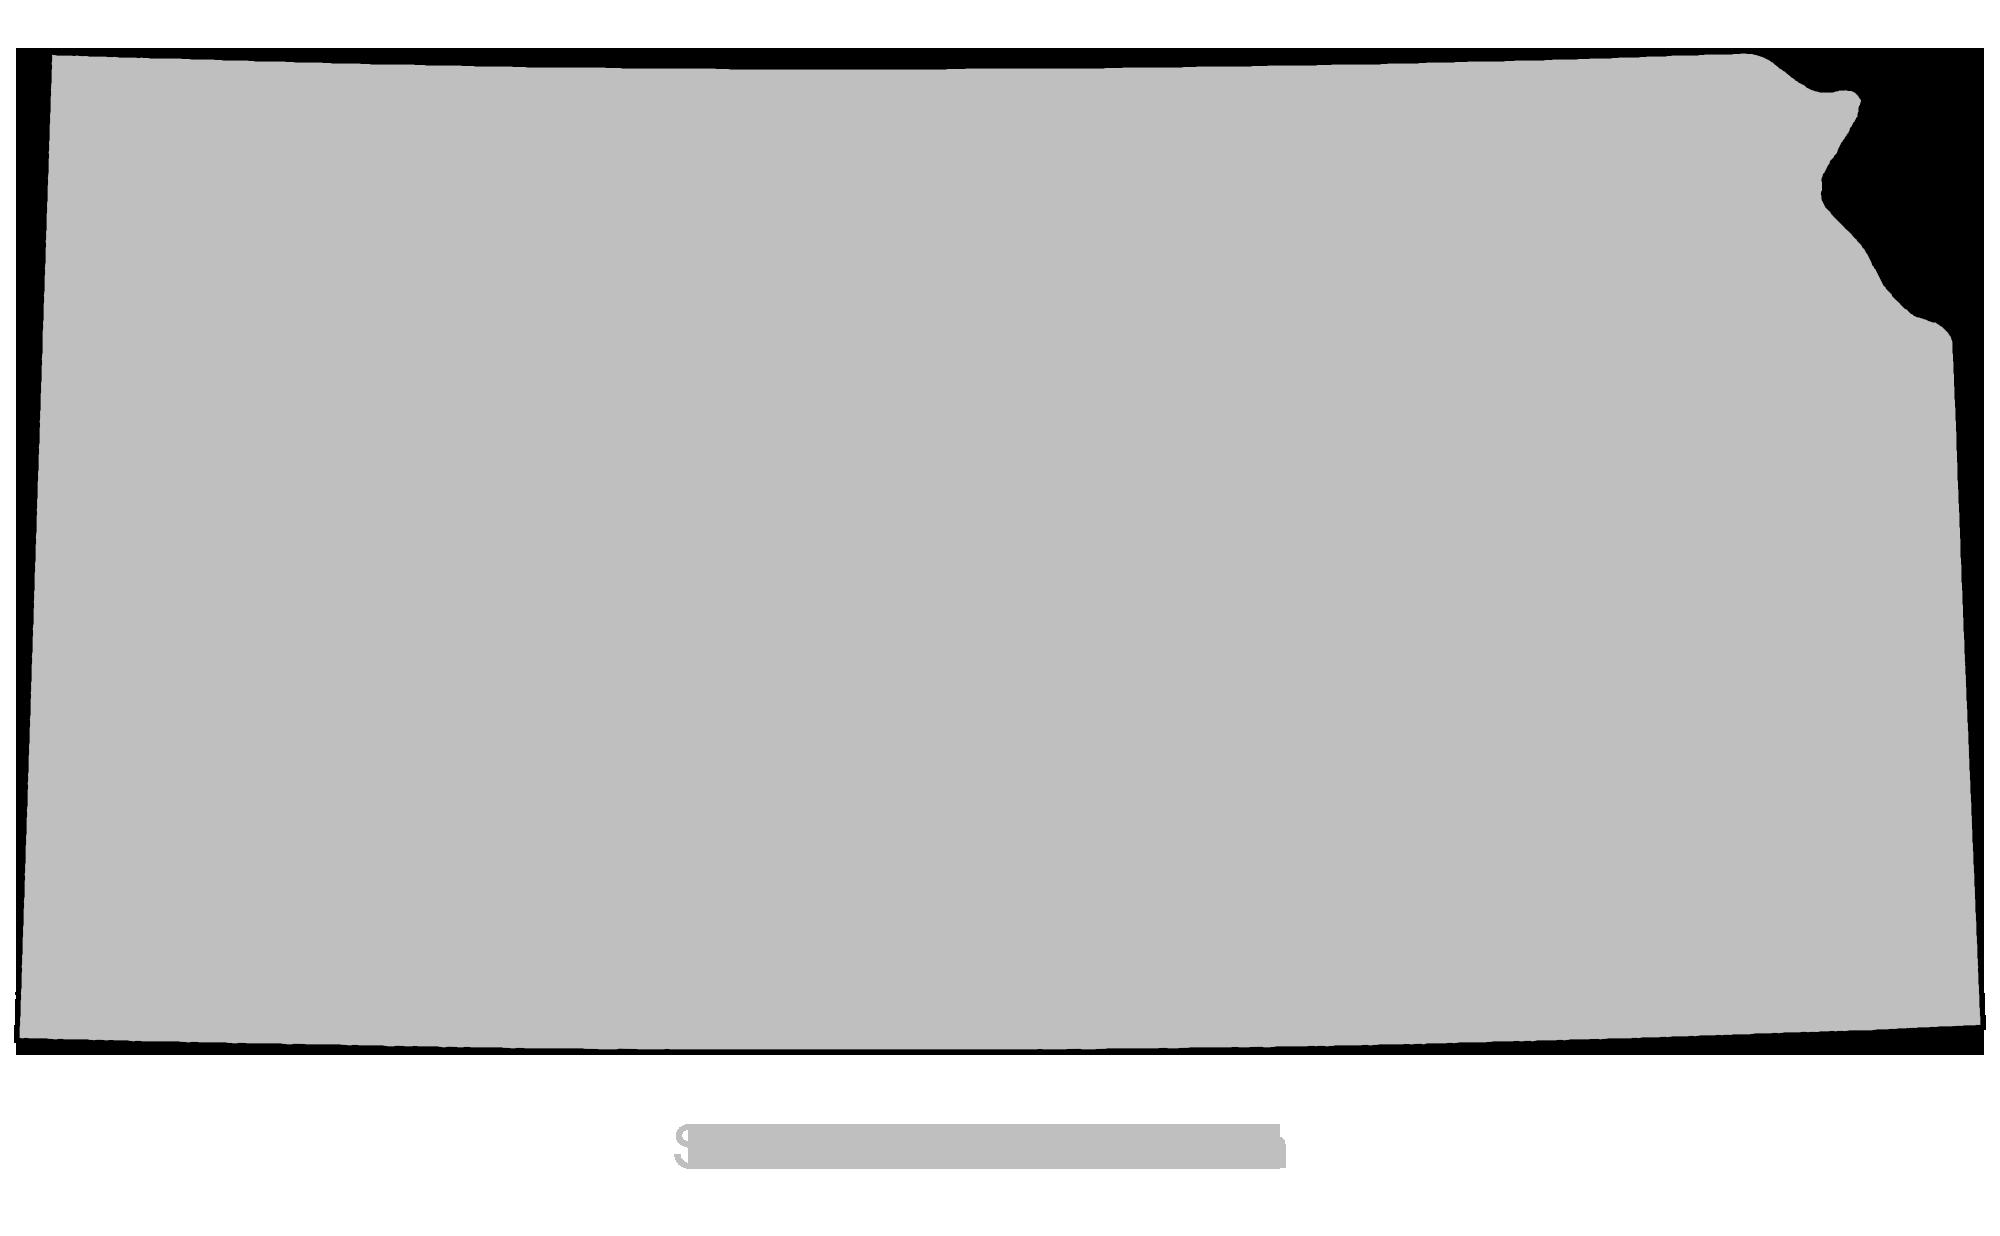 Kansas - Map Outline, Printable State, Shape, Stencil, Pattern ... on kansas silhouette, kansas state university colors, us map outline, qatar map outline, kansas river map, kansas map with highways, kansas state bird, kansas state symbols, kansas state seal, kansas outline template, kansas state animal, kansas state flag, kansas bordering states, kansas flag outline, kansas state shape, columbia map outline, kansas county map printable, kansas state coloring pages, kansas st, canada map outline,